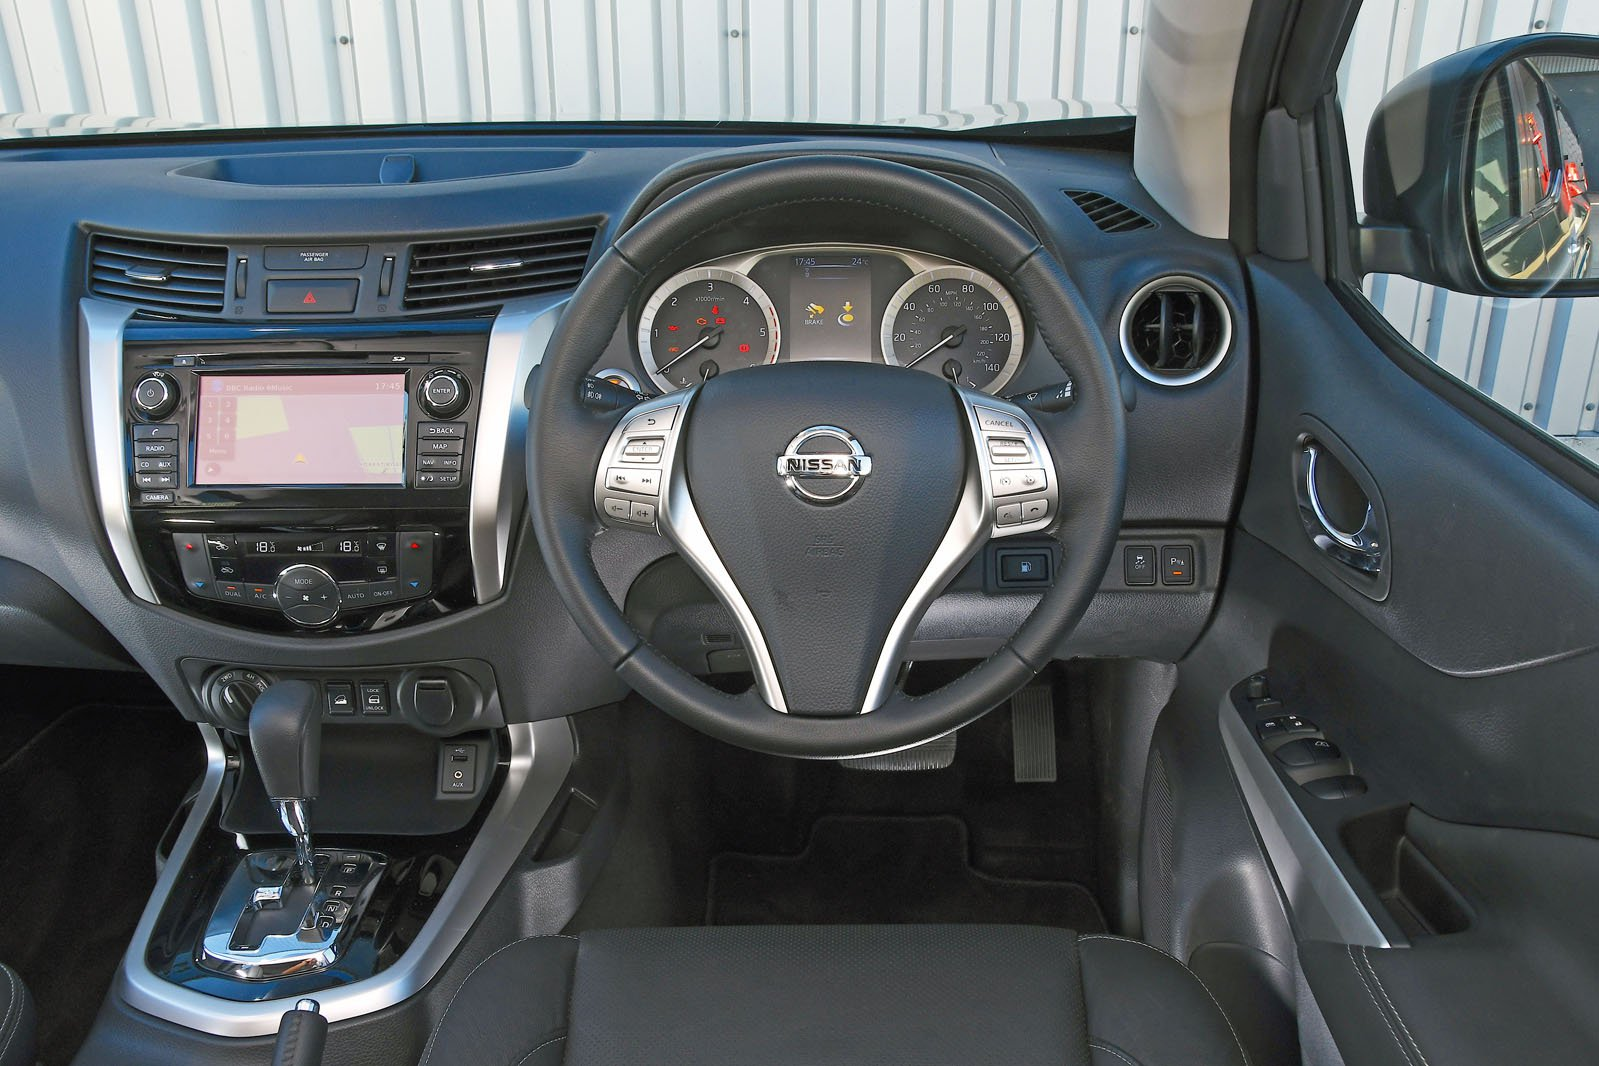 Nissan Navara 2018 RHD dashboard